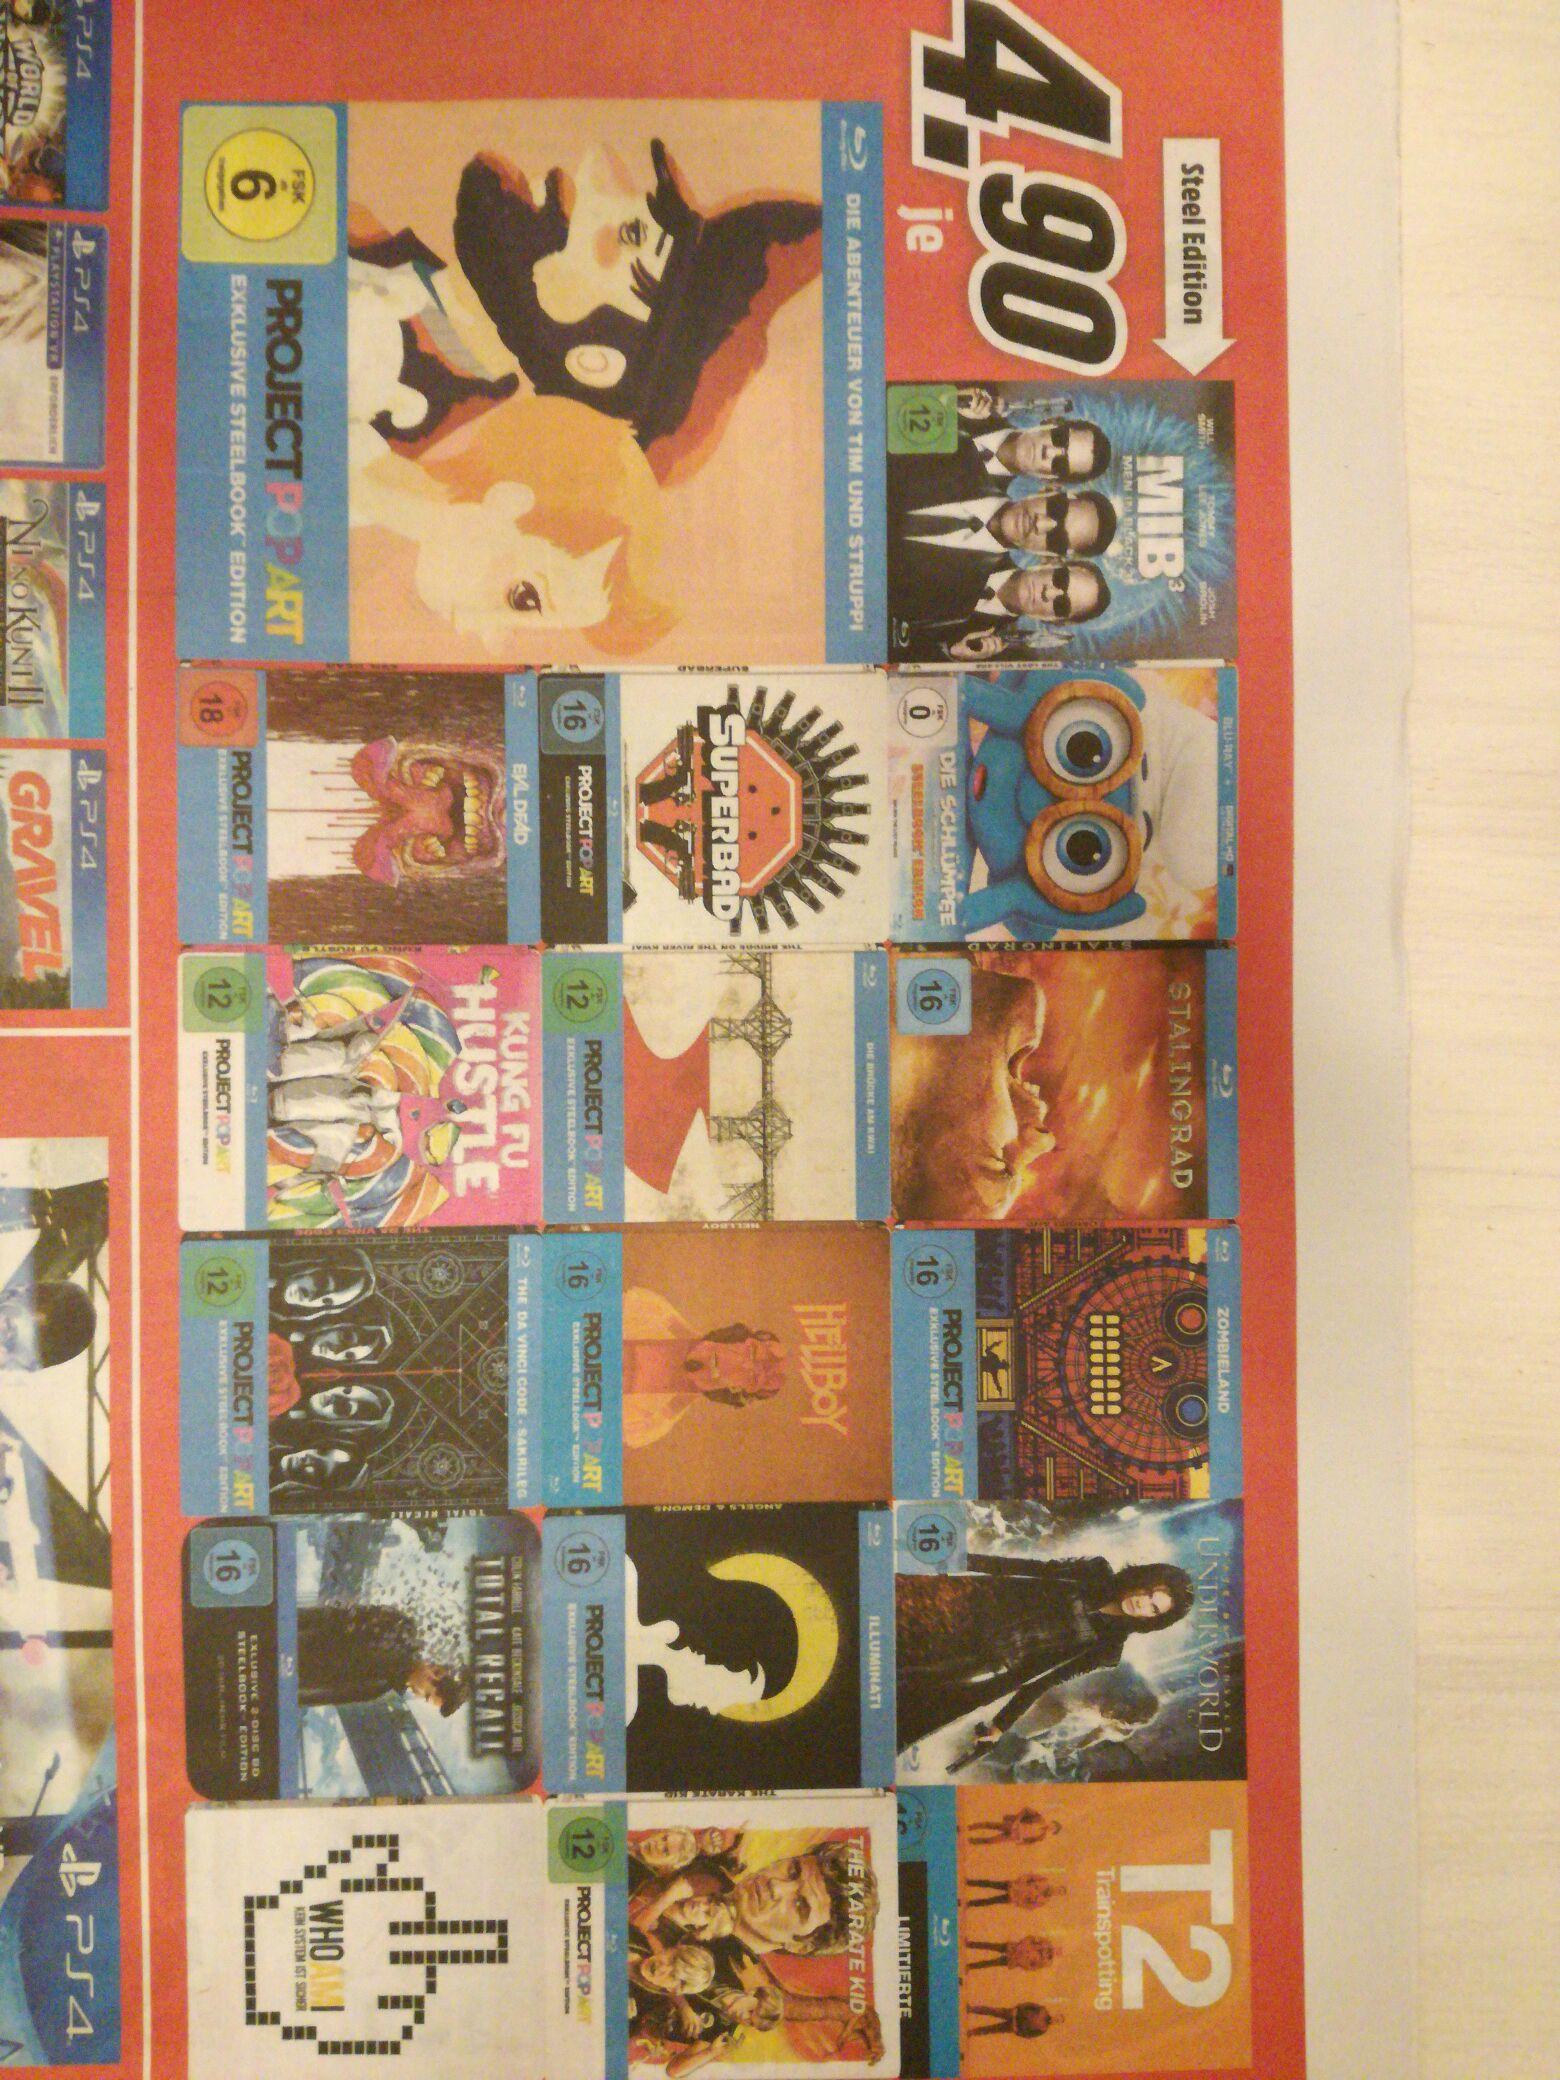 Media Markt Koblenz [lokal] diverse Steelboxen Blu-ray €4,90